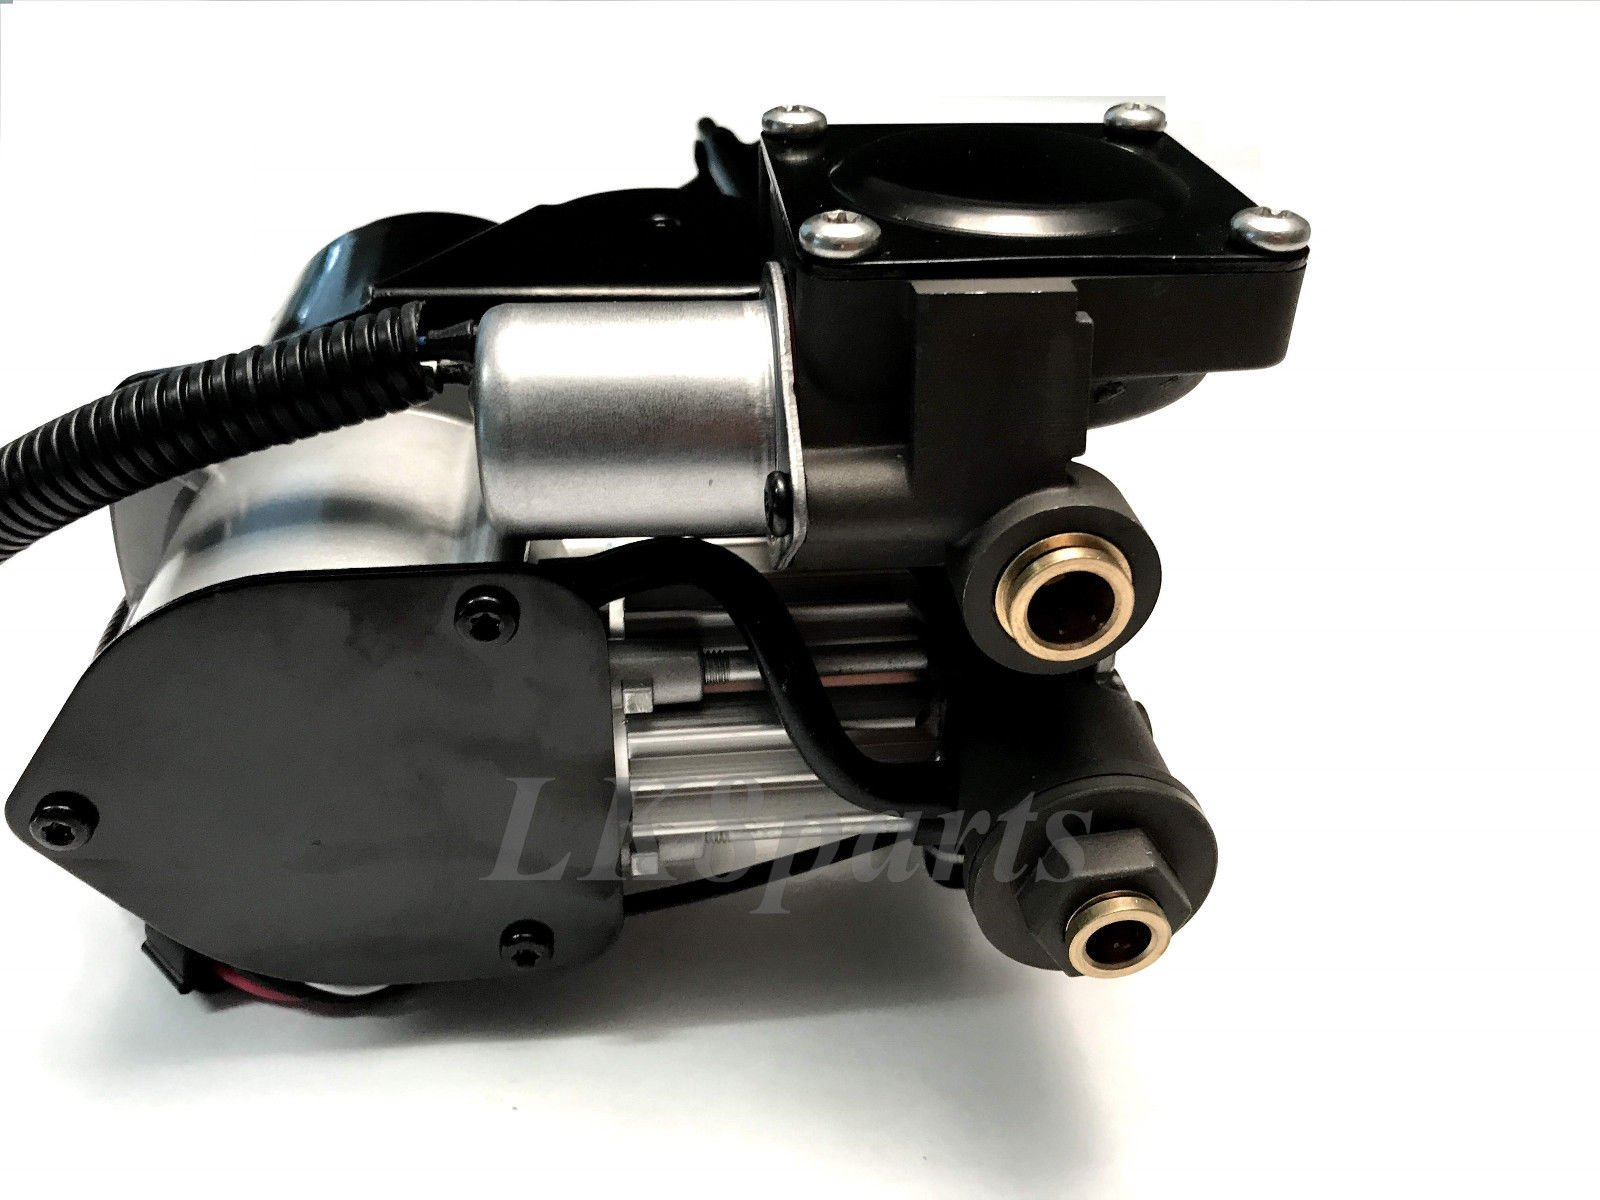 Land Rover Range Rover Sport LR3 HD Long Life Compressor Suspension Air Compressor by Proper Spec (Image #5)